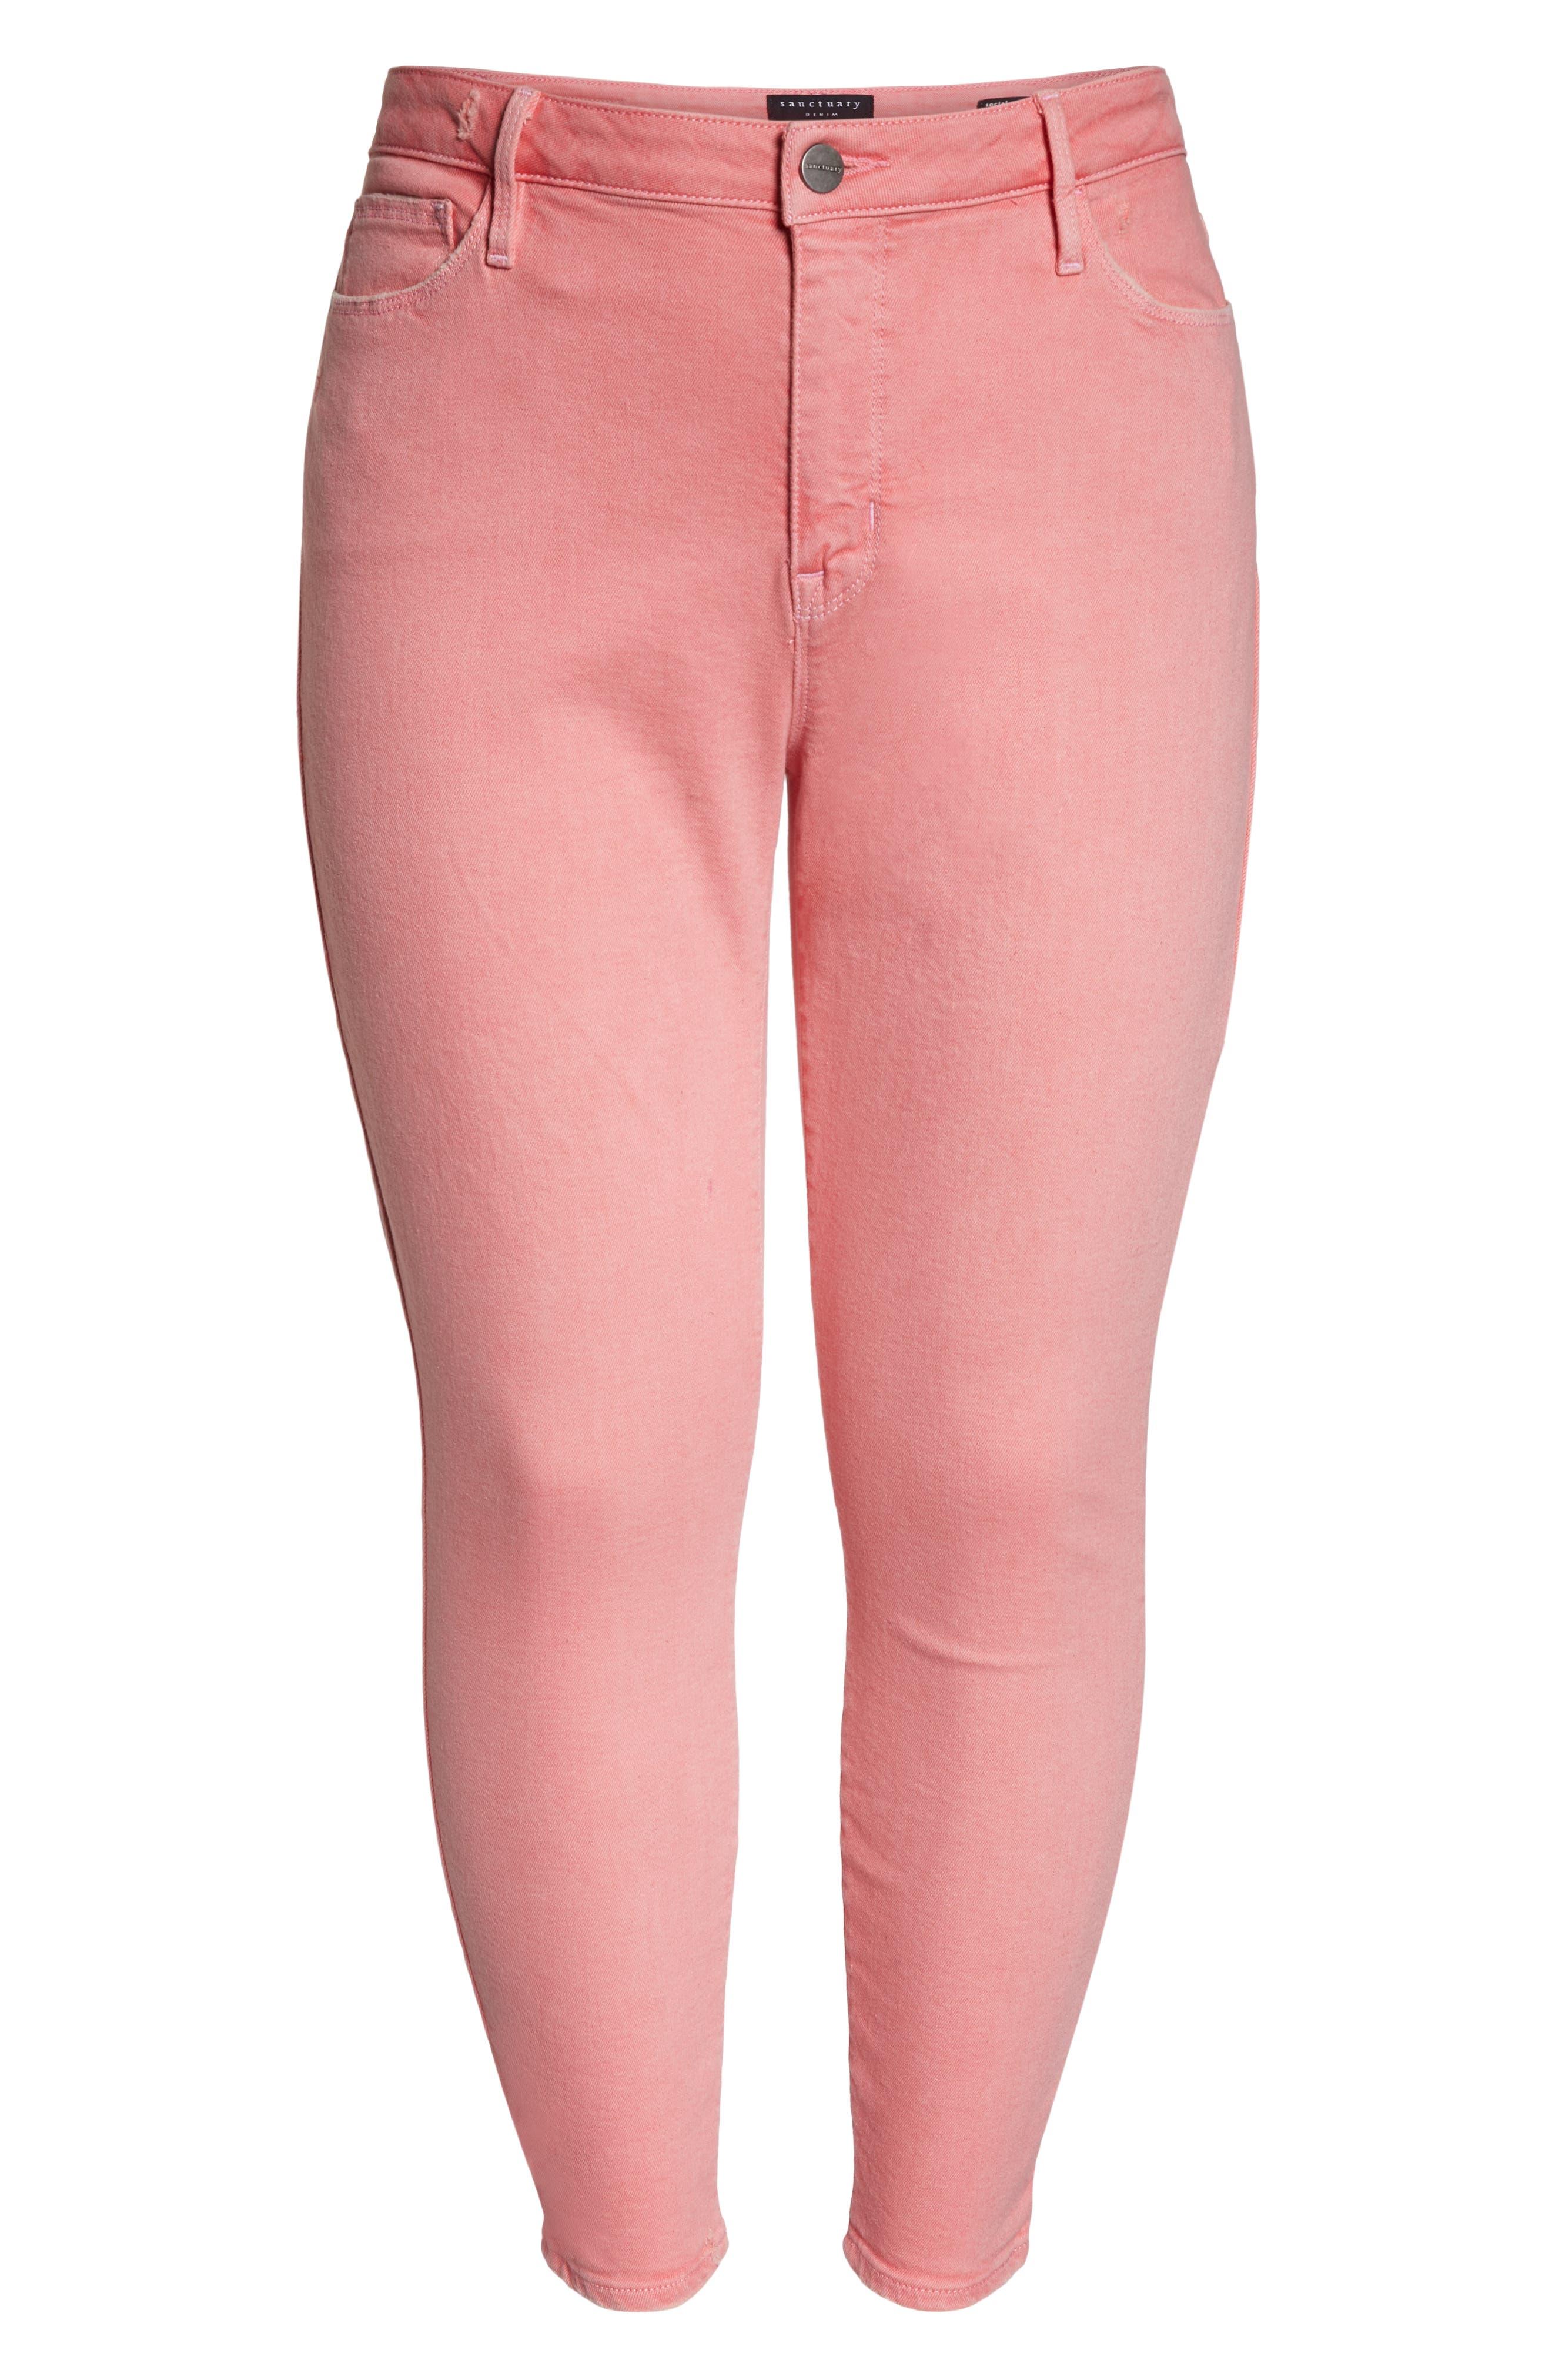 SANCTUARY,                             Social Standard Ankle Skinny Jeans,                             Alternate thumbnail 7, color,                             DK PNK FIZ